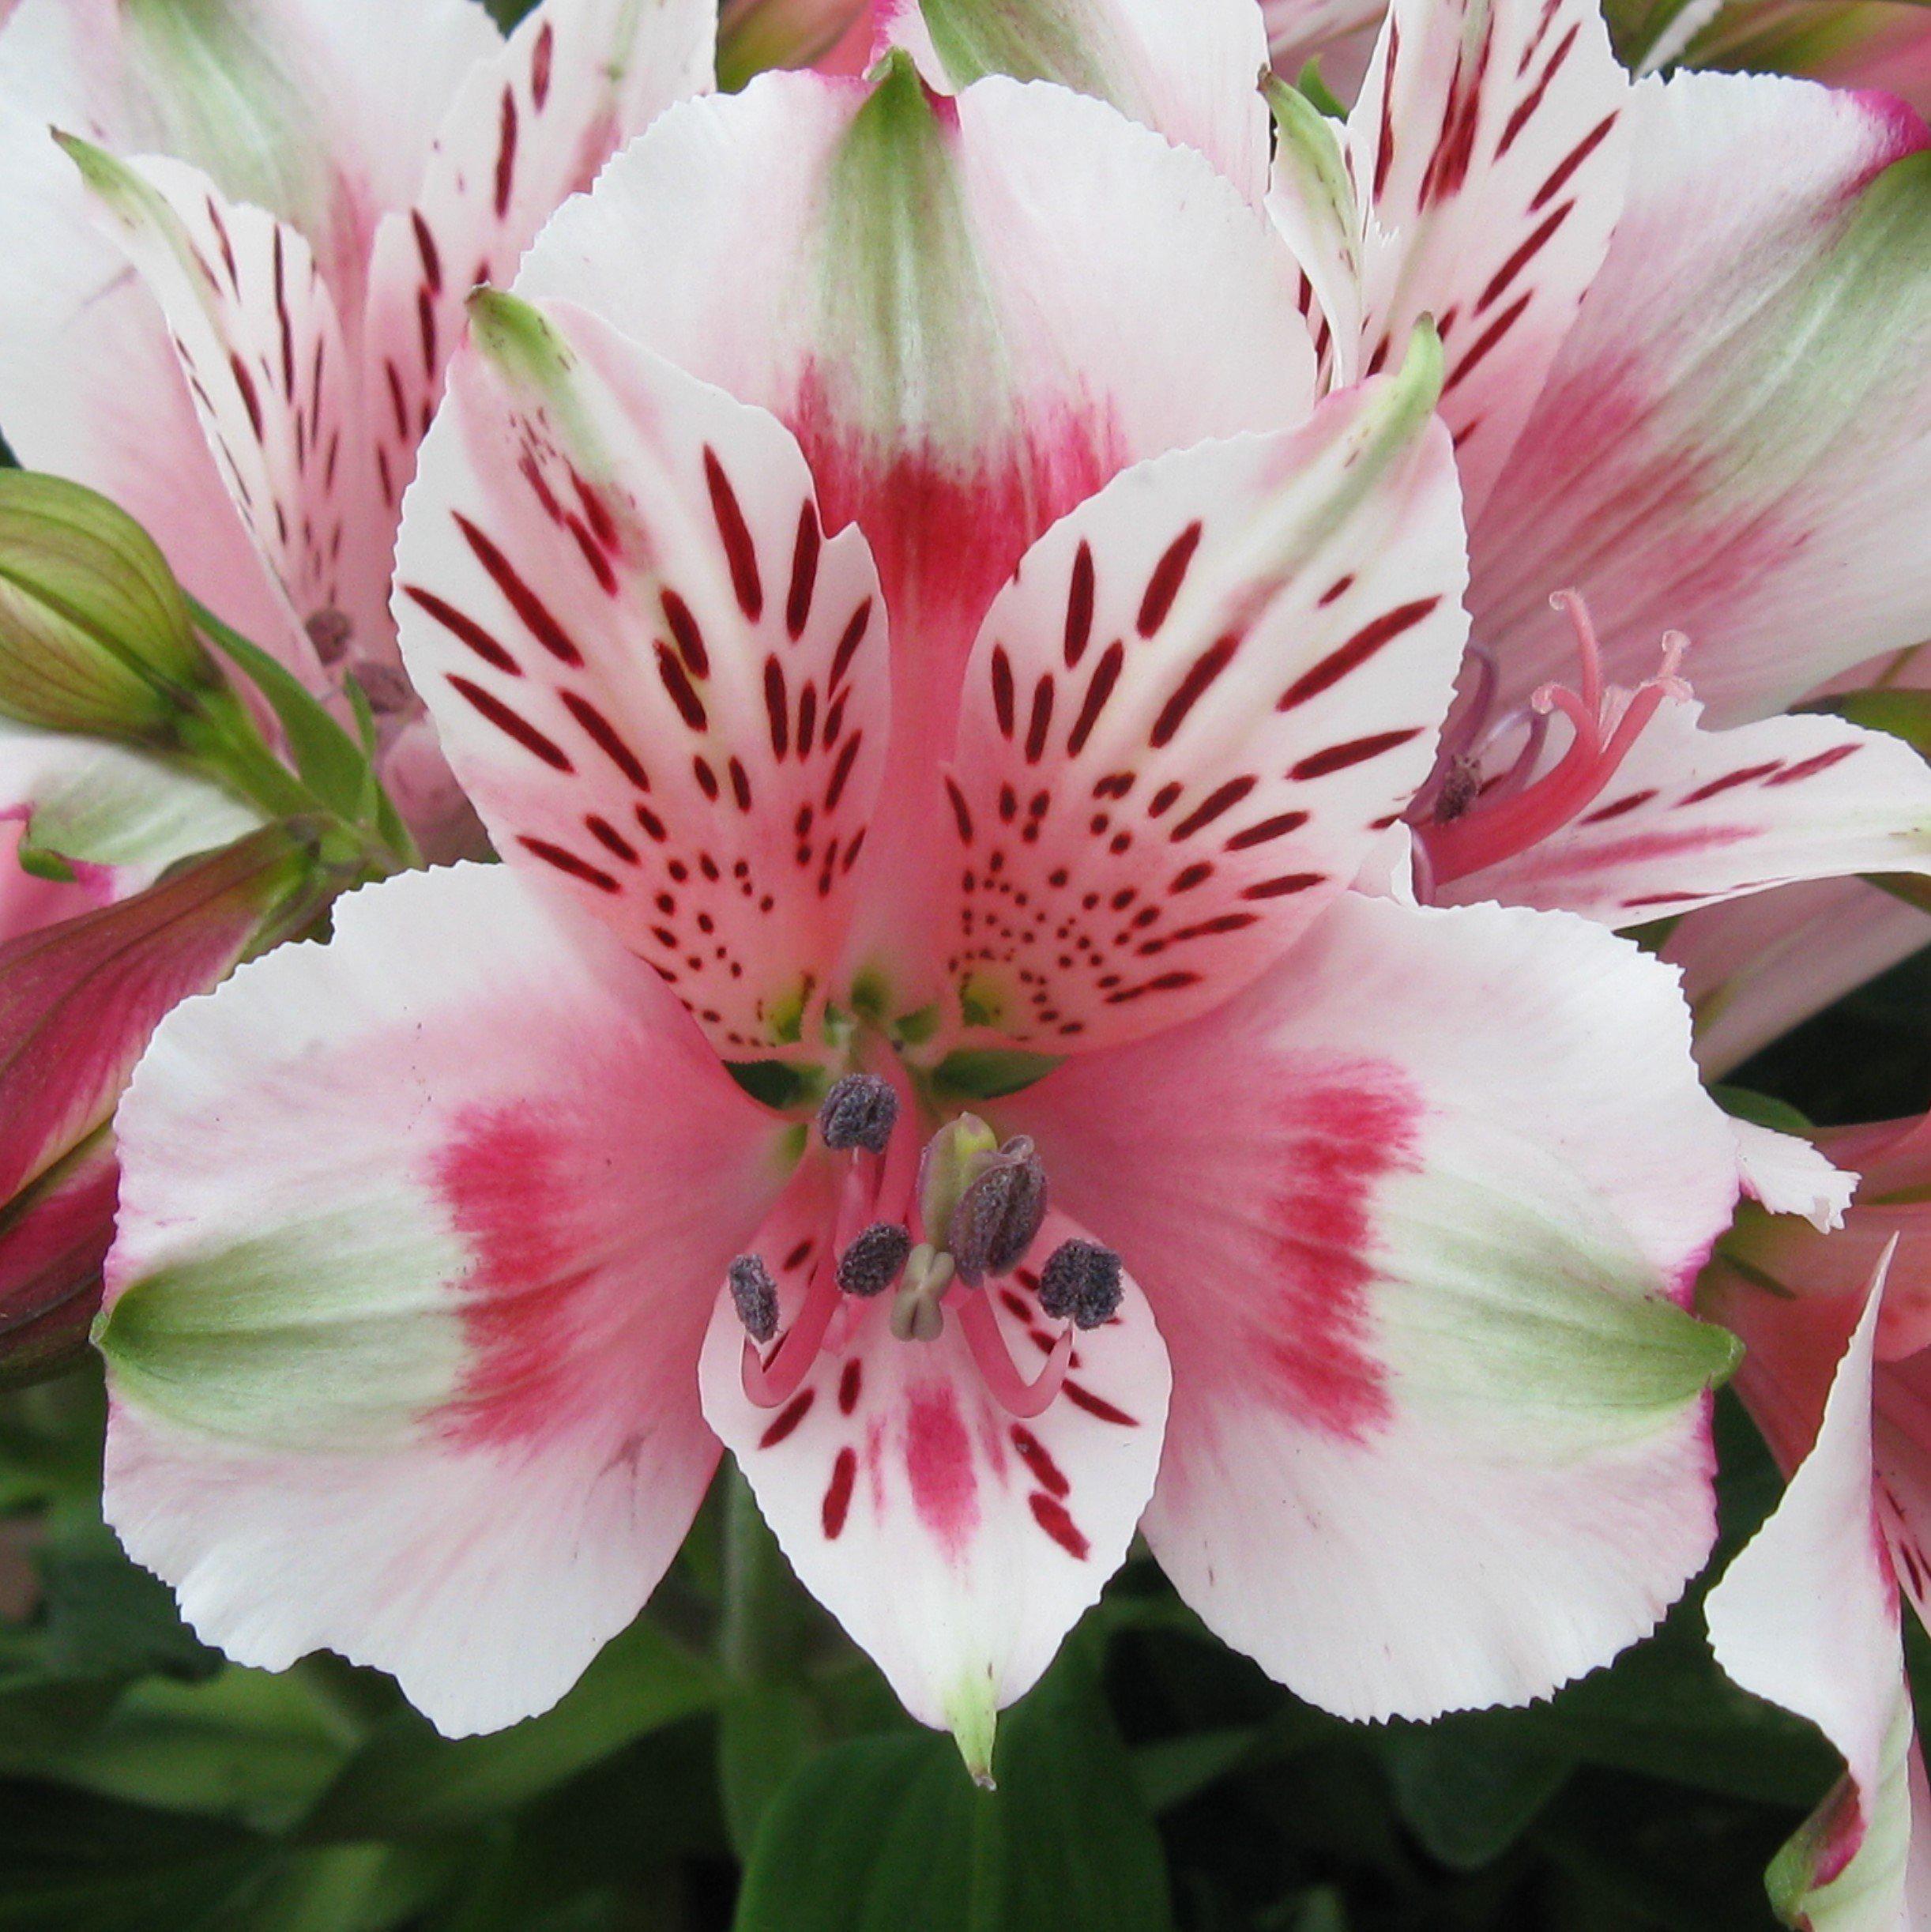 Allium Ampeloprasum Spanish Allium Flowers Perennials Easy To Grow Bulbs Flower Seeds